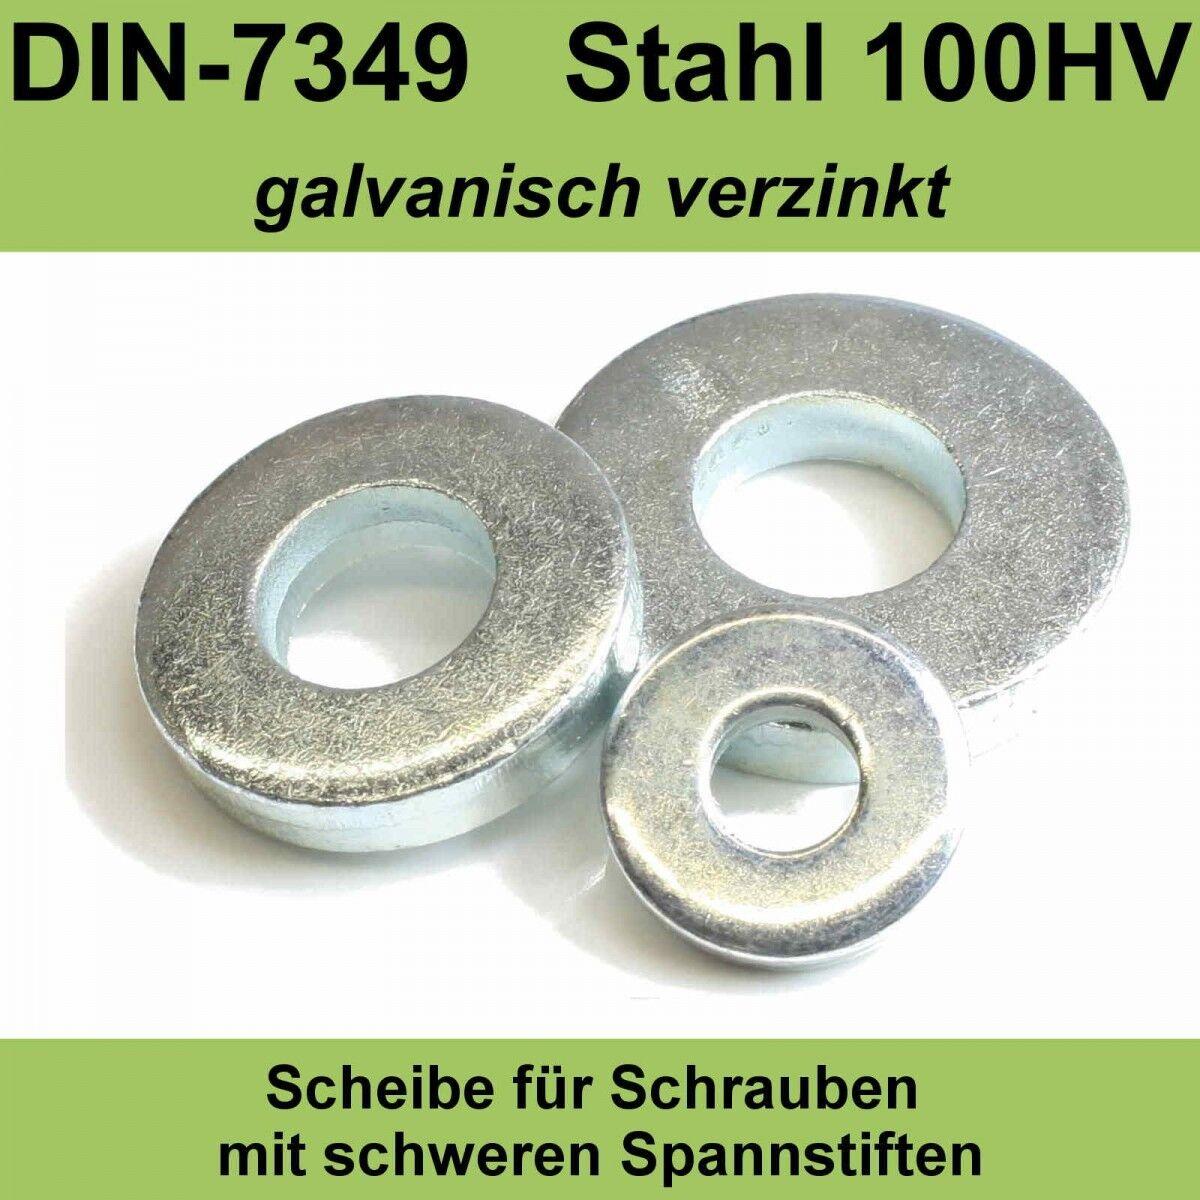 19,0 DIN7349 Unterlegscheiben verzinkt f schwerer Spann-hülse Stifte 200 HV M18